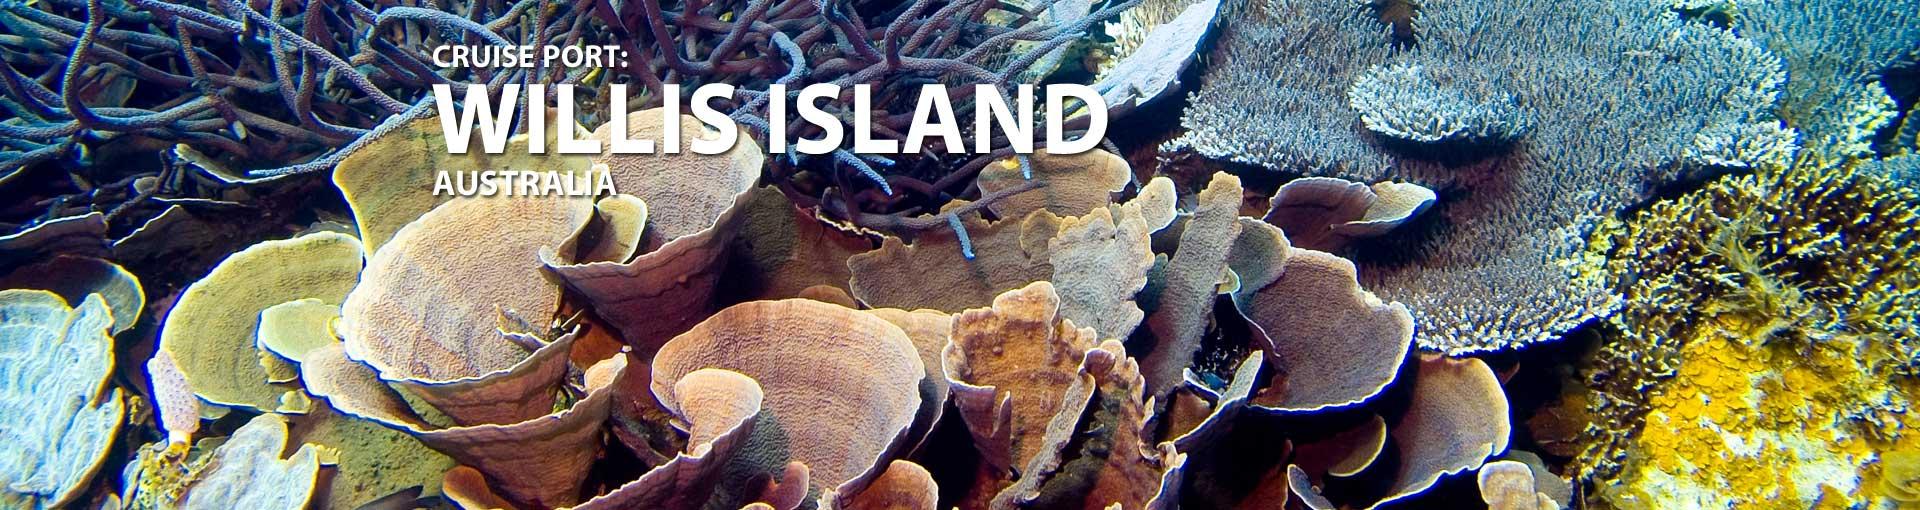 Cruises to Willis Island